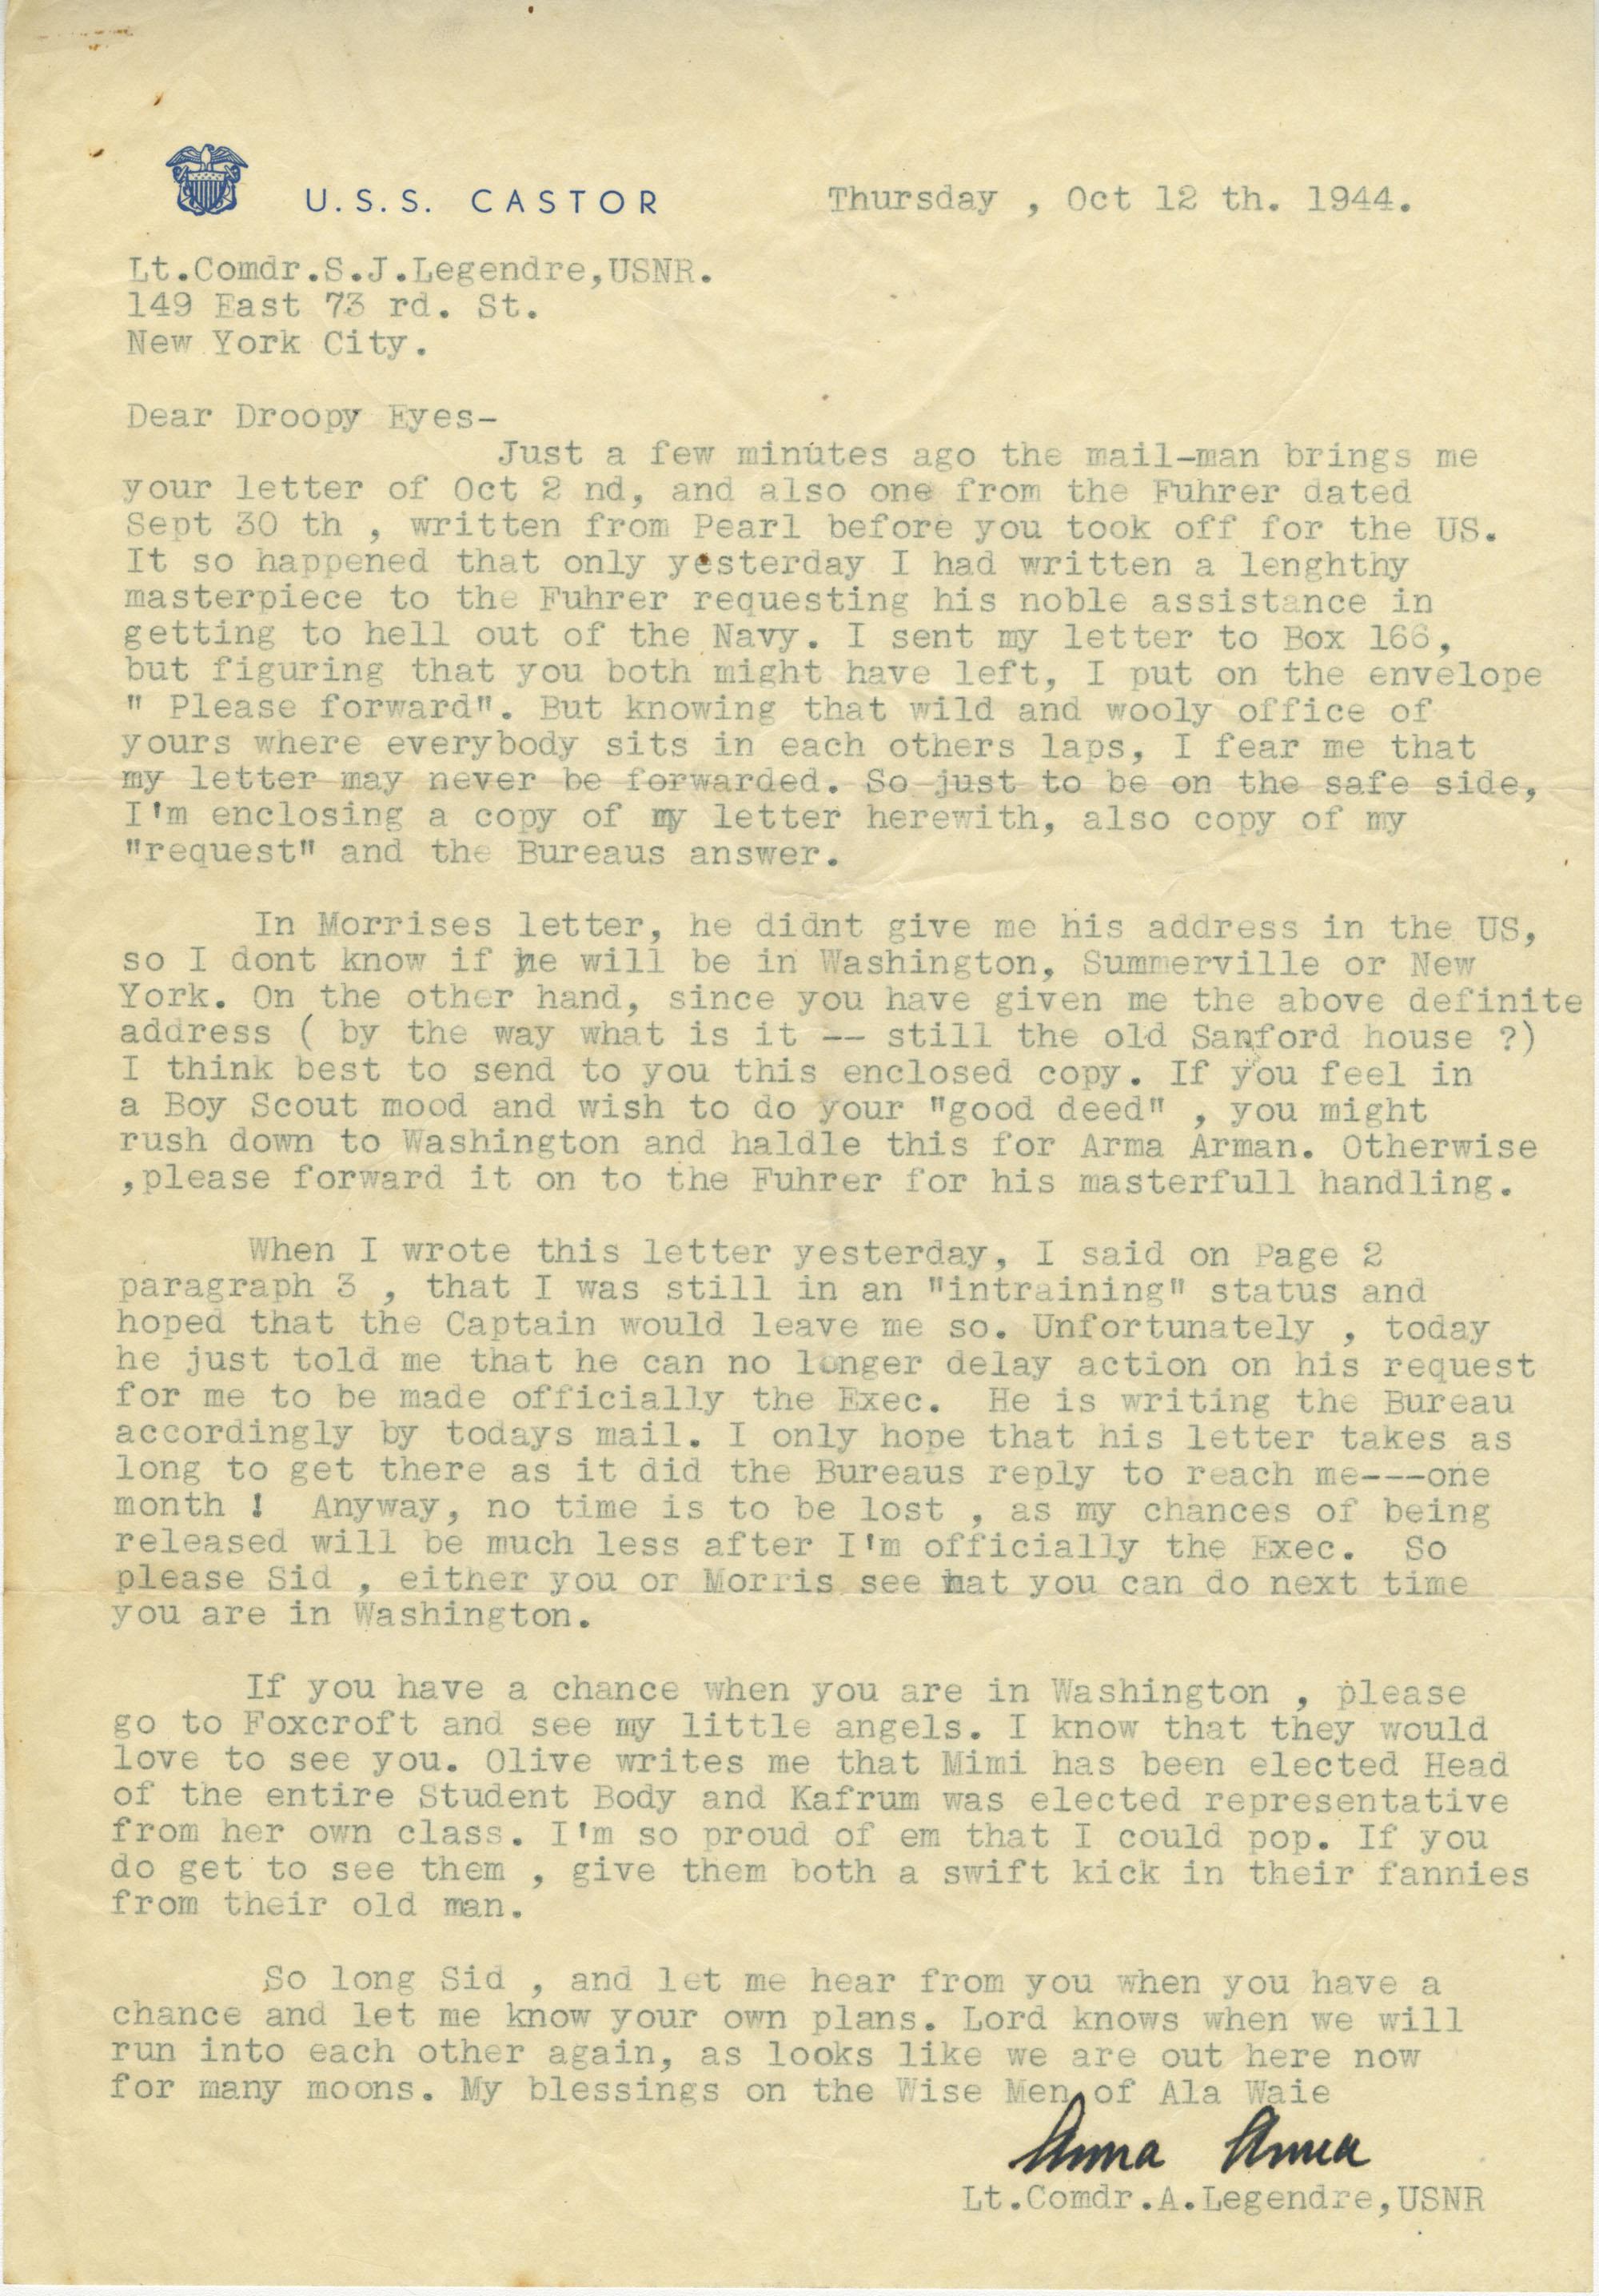 Letter from Armant Legendre, October 12, 1944